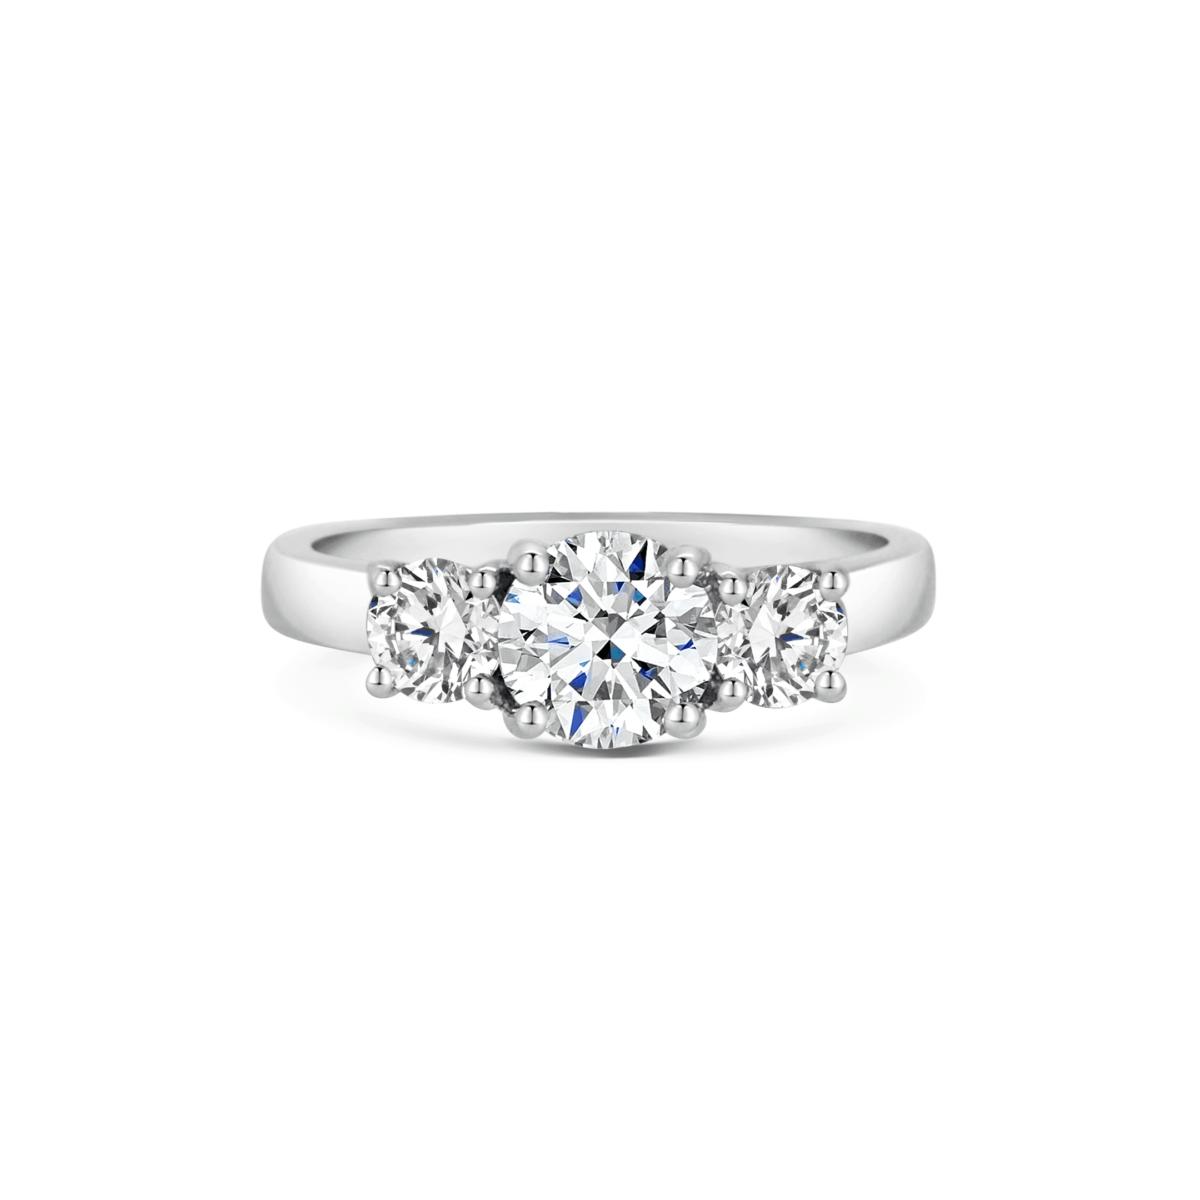 Katriane Round Cut Diamond Three Stone Engagement Ring Front View